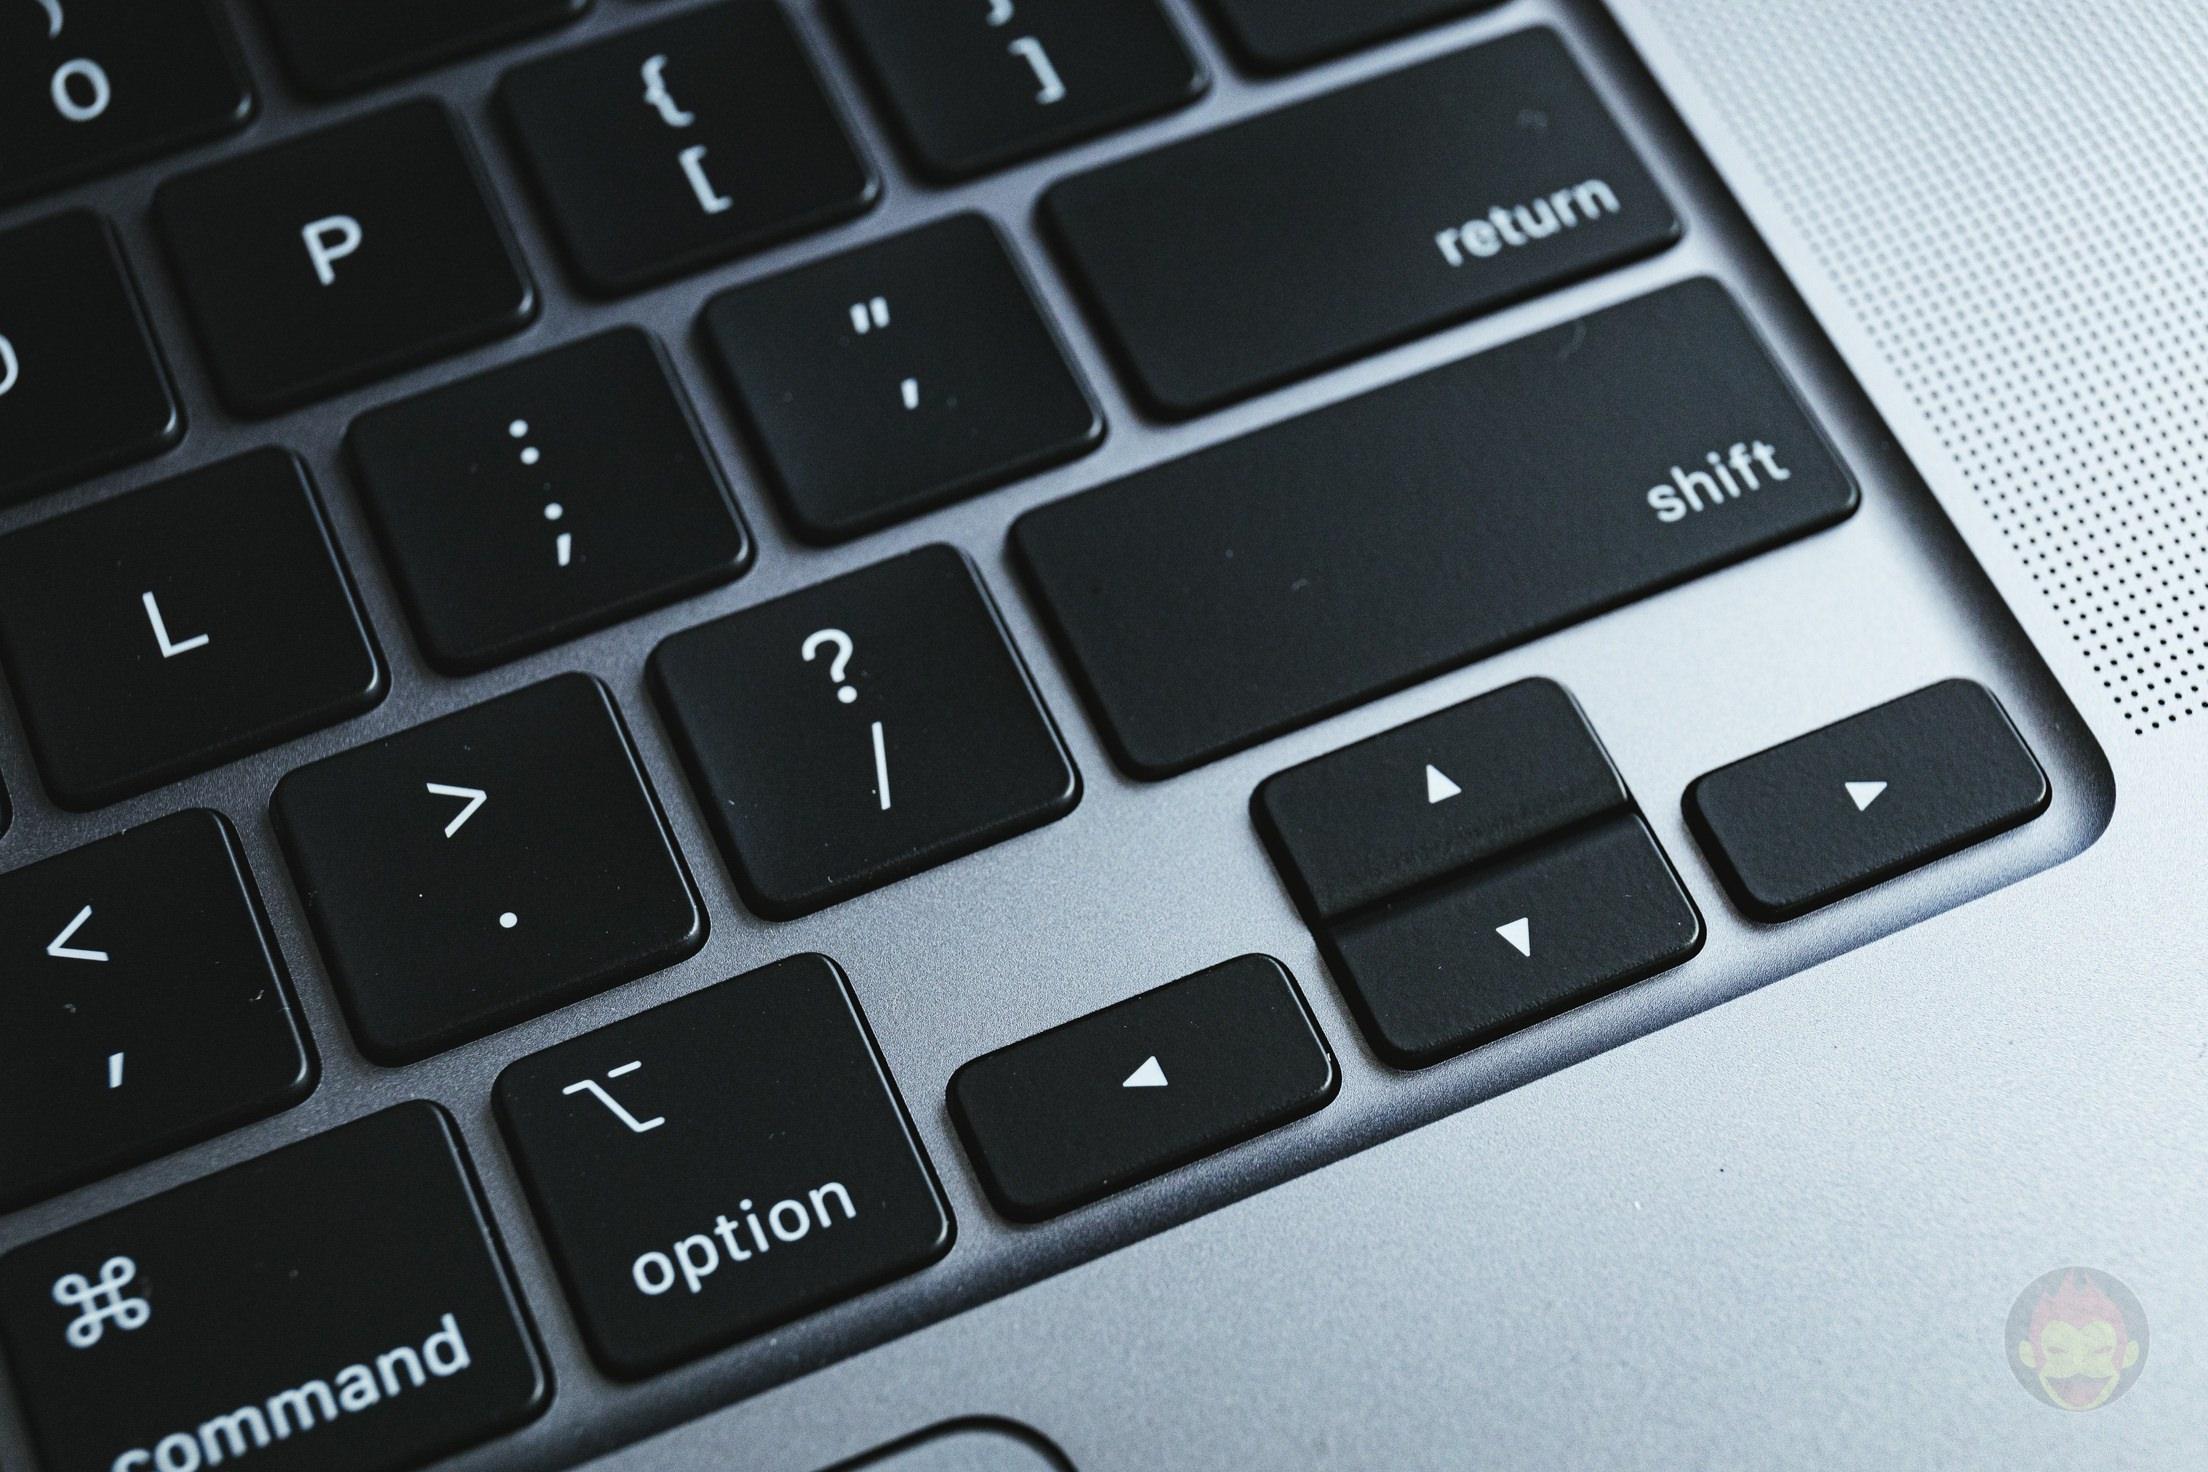 MacBook-Pro-2019-16inch-Review-BlueBackground-03.jpg